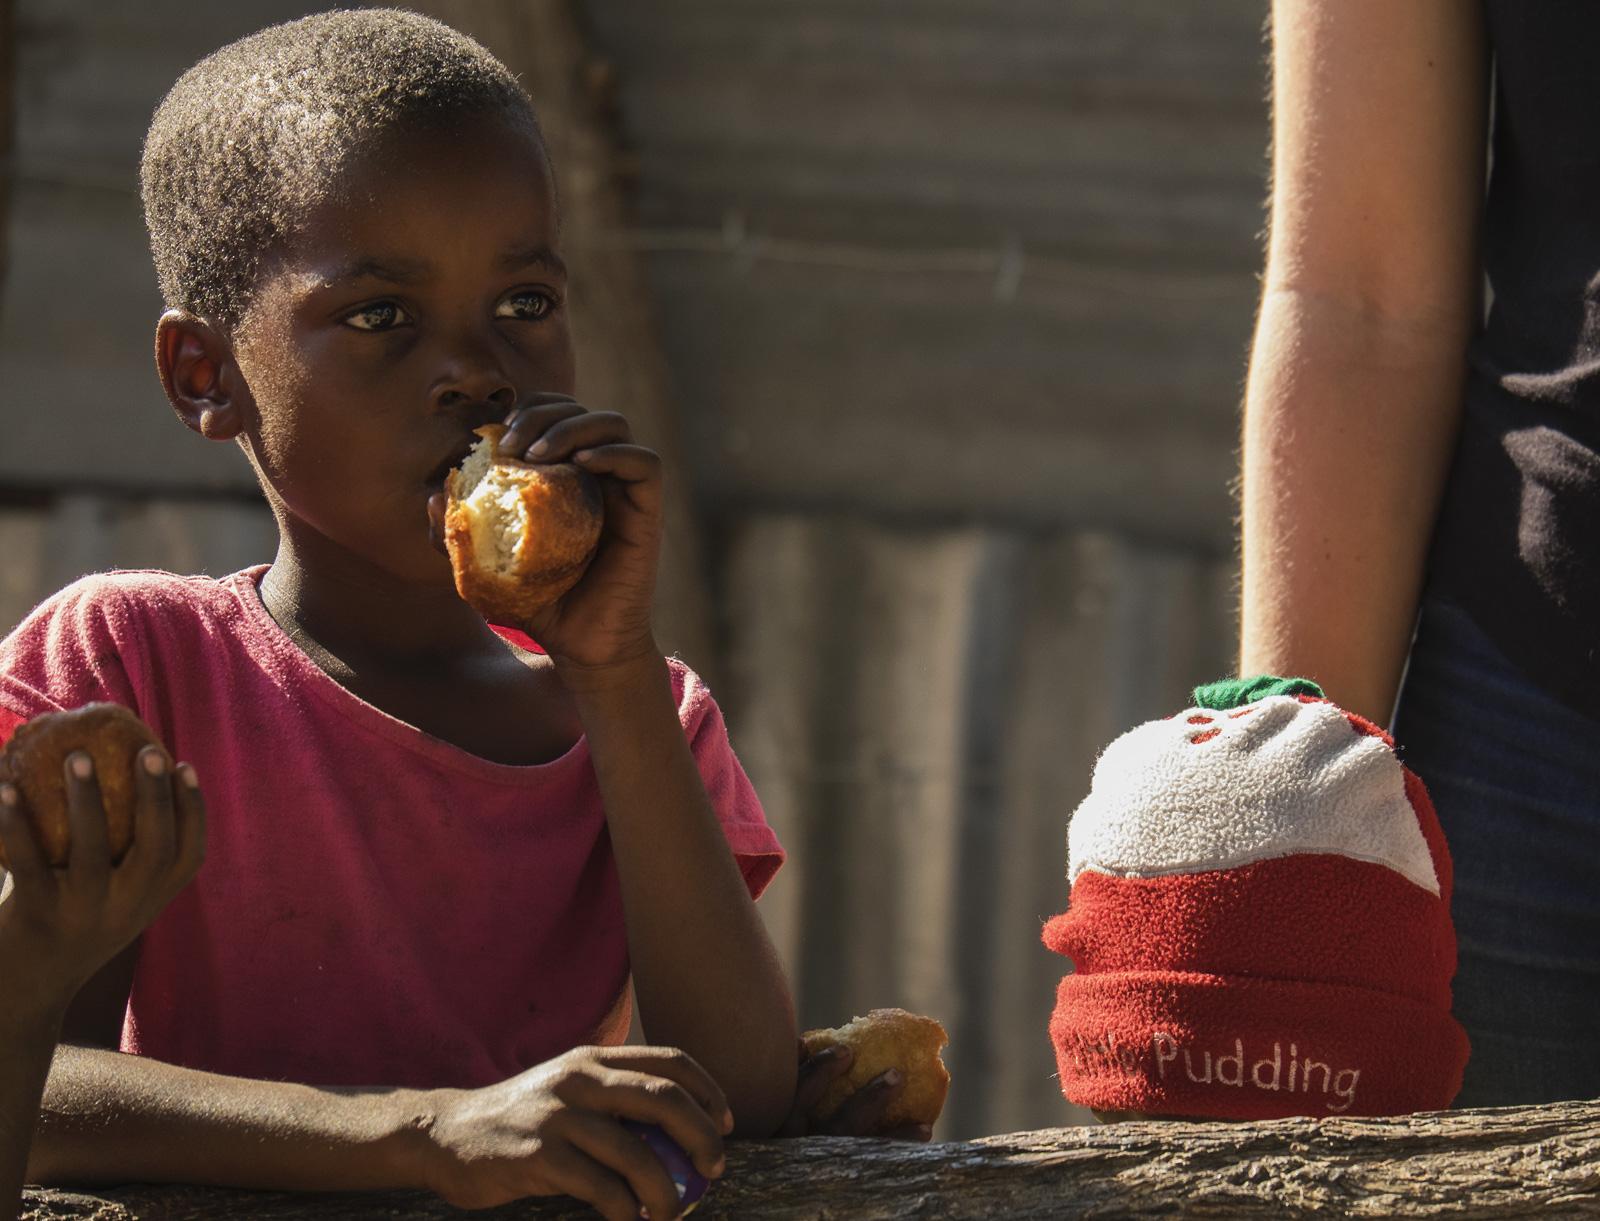 Little Pudden, Okavango Delta, Botswana, Africa, walk, village, group, kids, tin, shack, home, doughnuts, hat  , photo